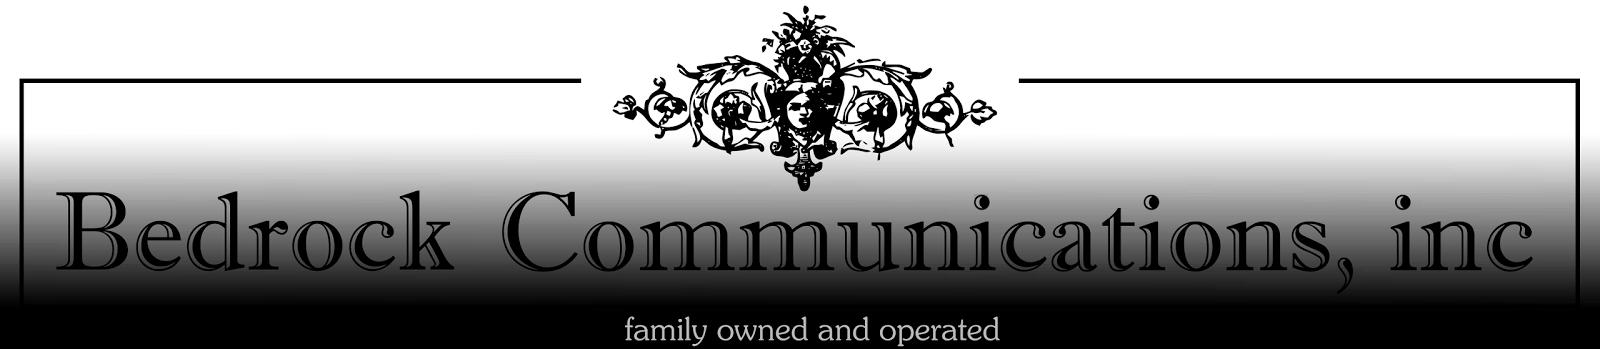 Bedrock Communications, Inc.